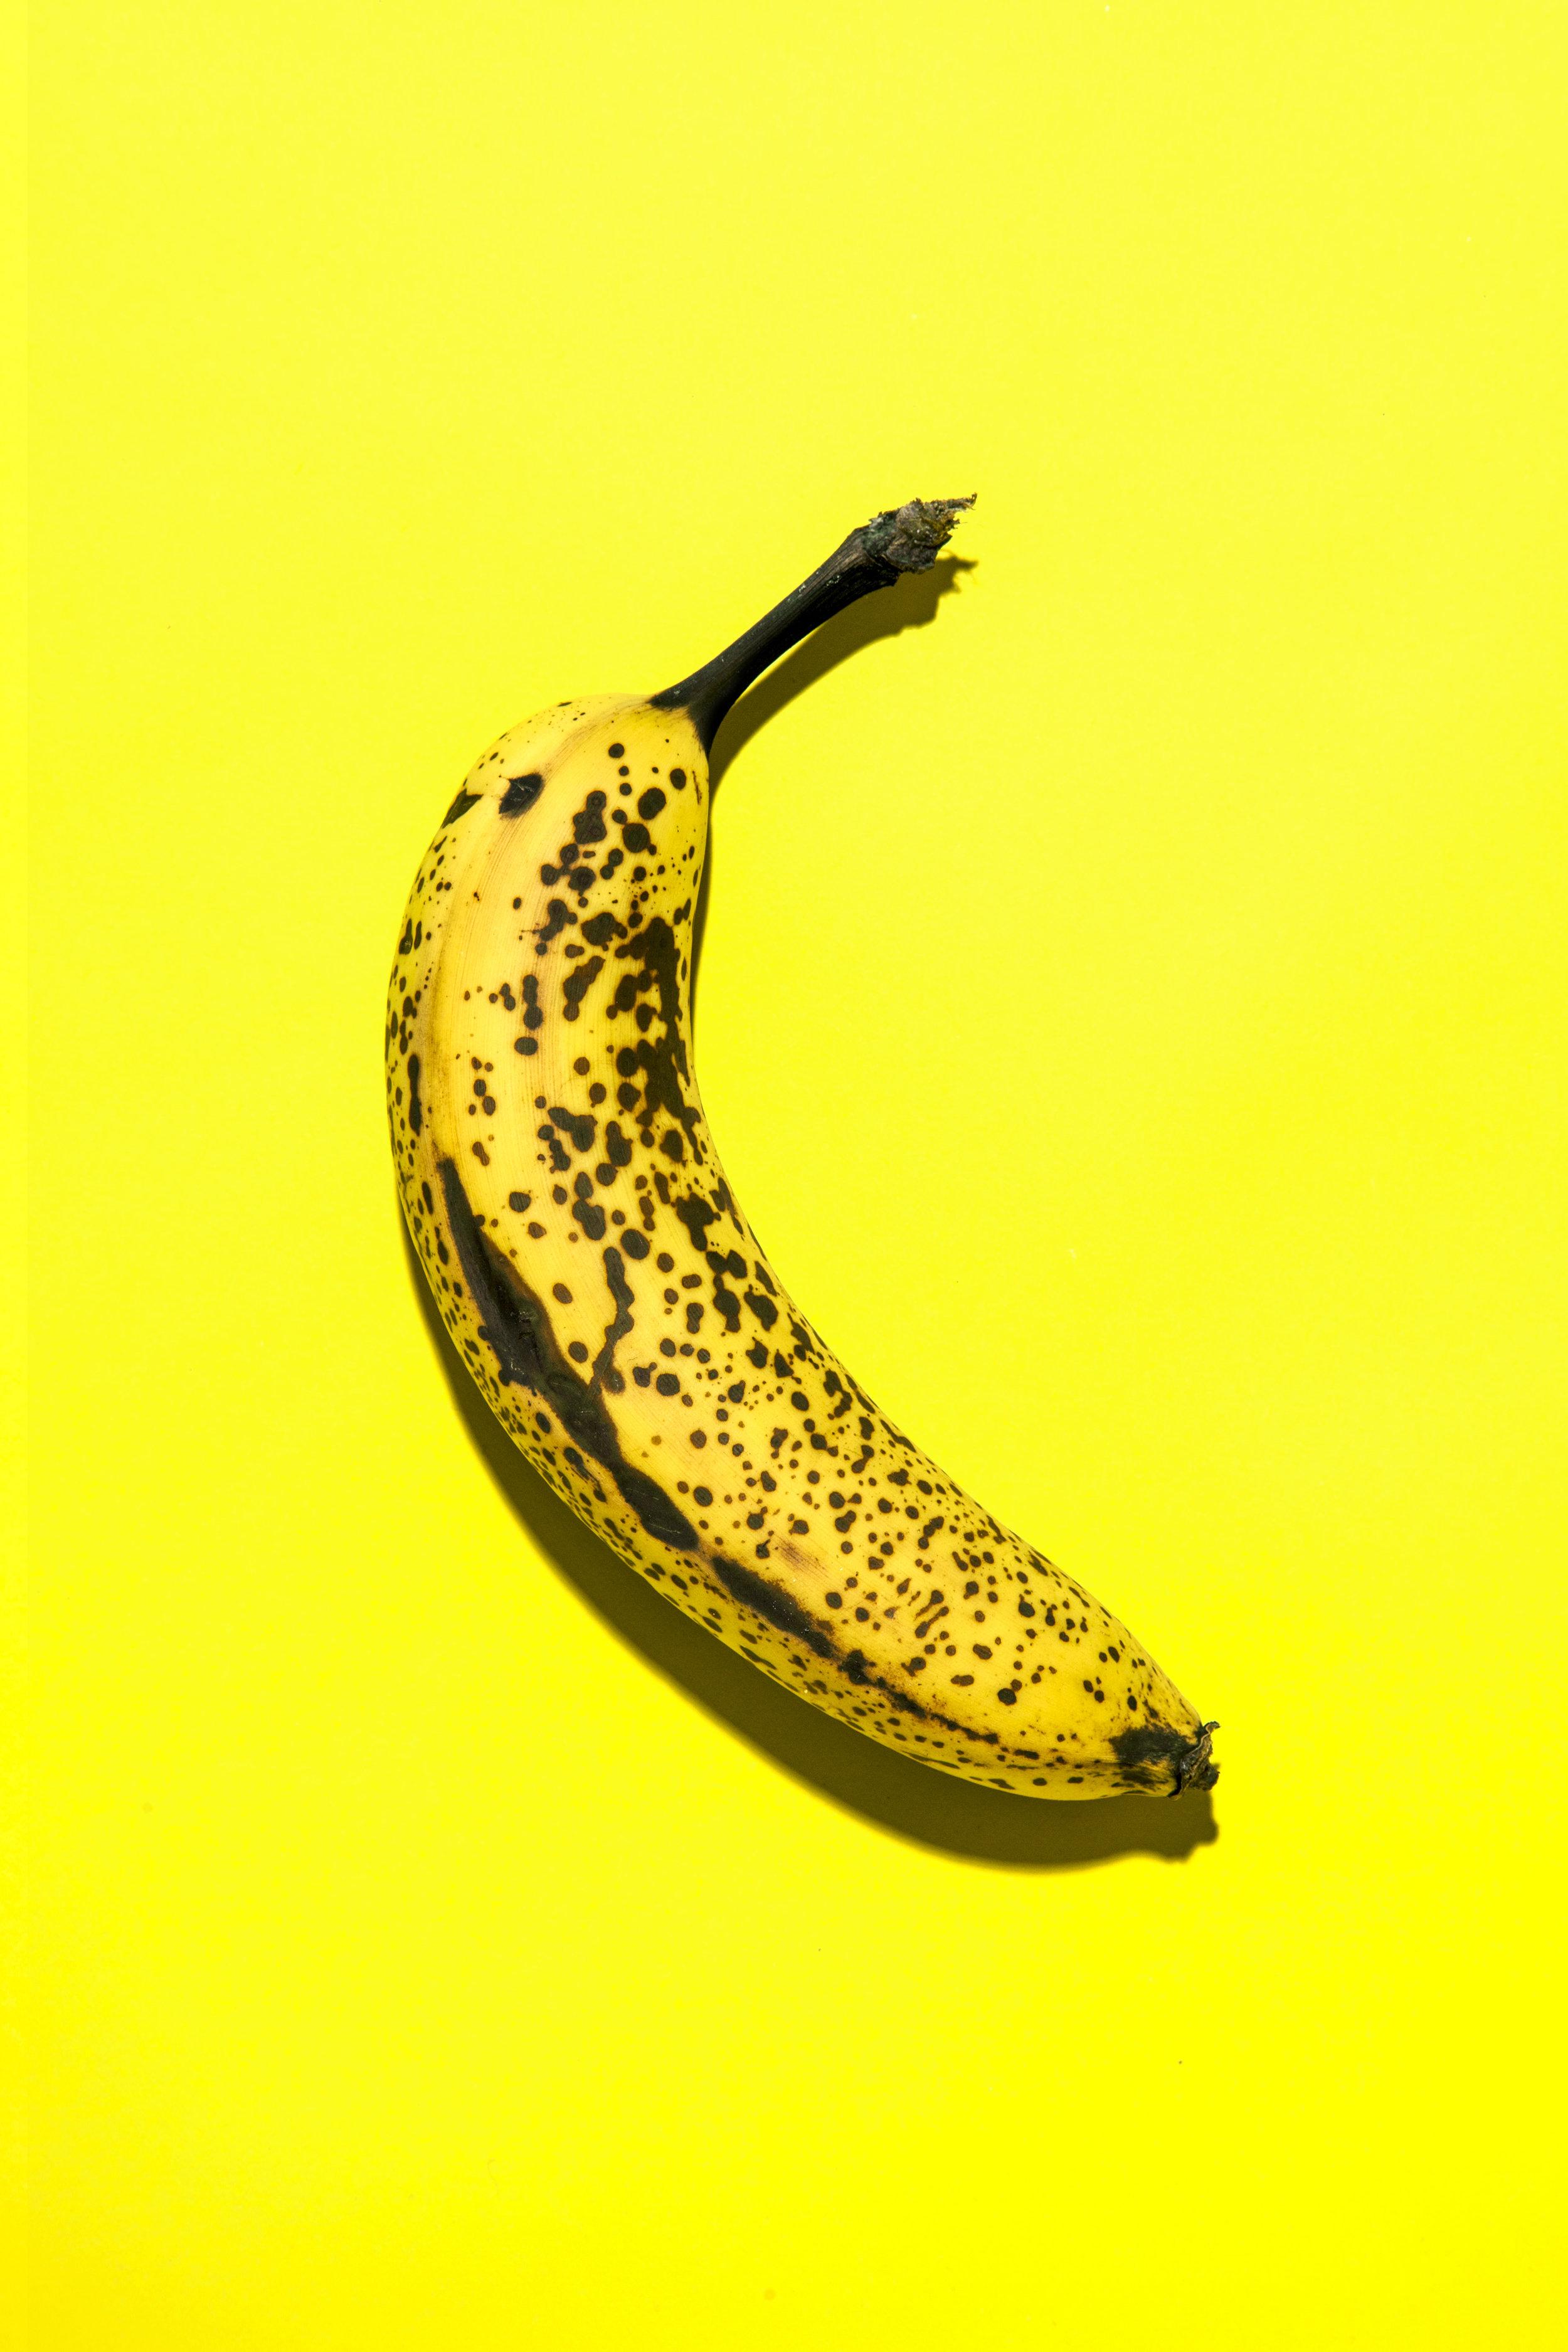 Banana_01.jpg